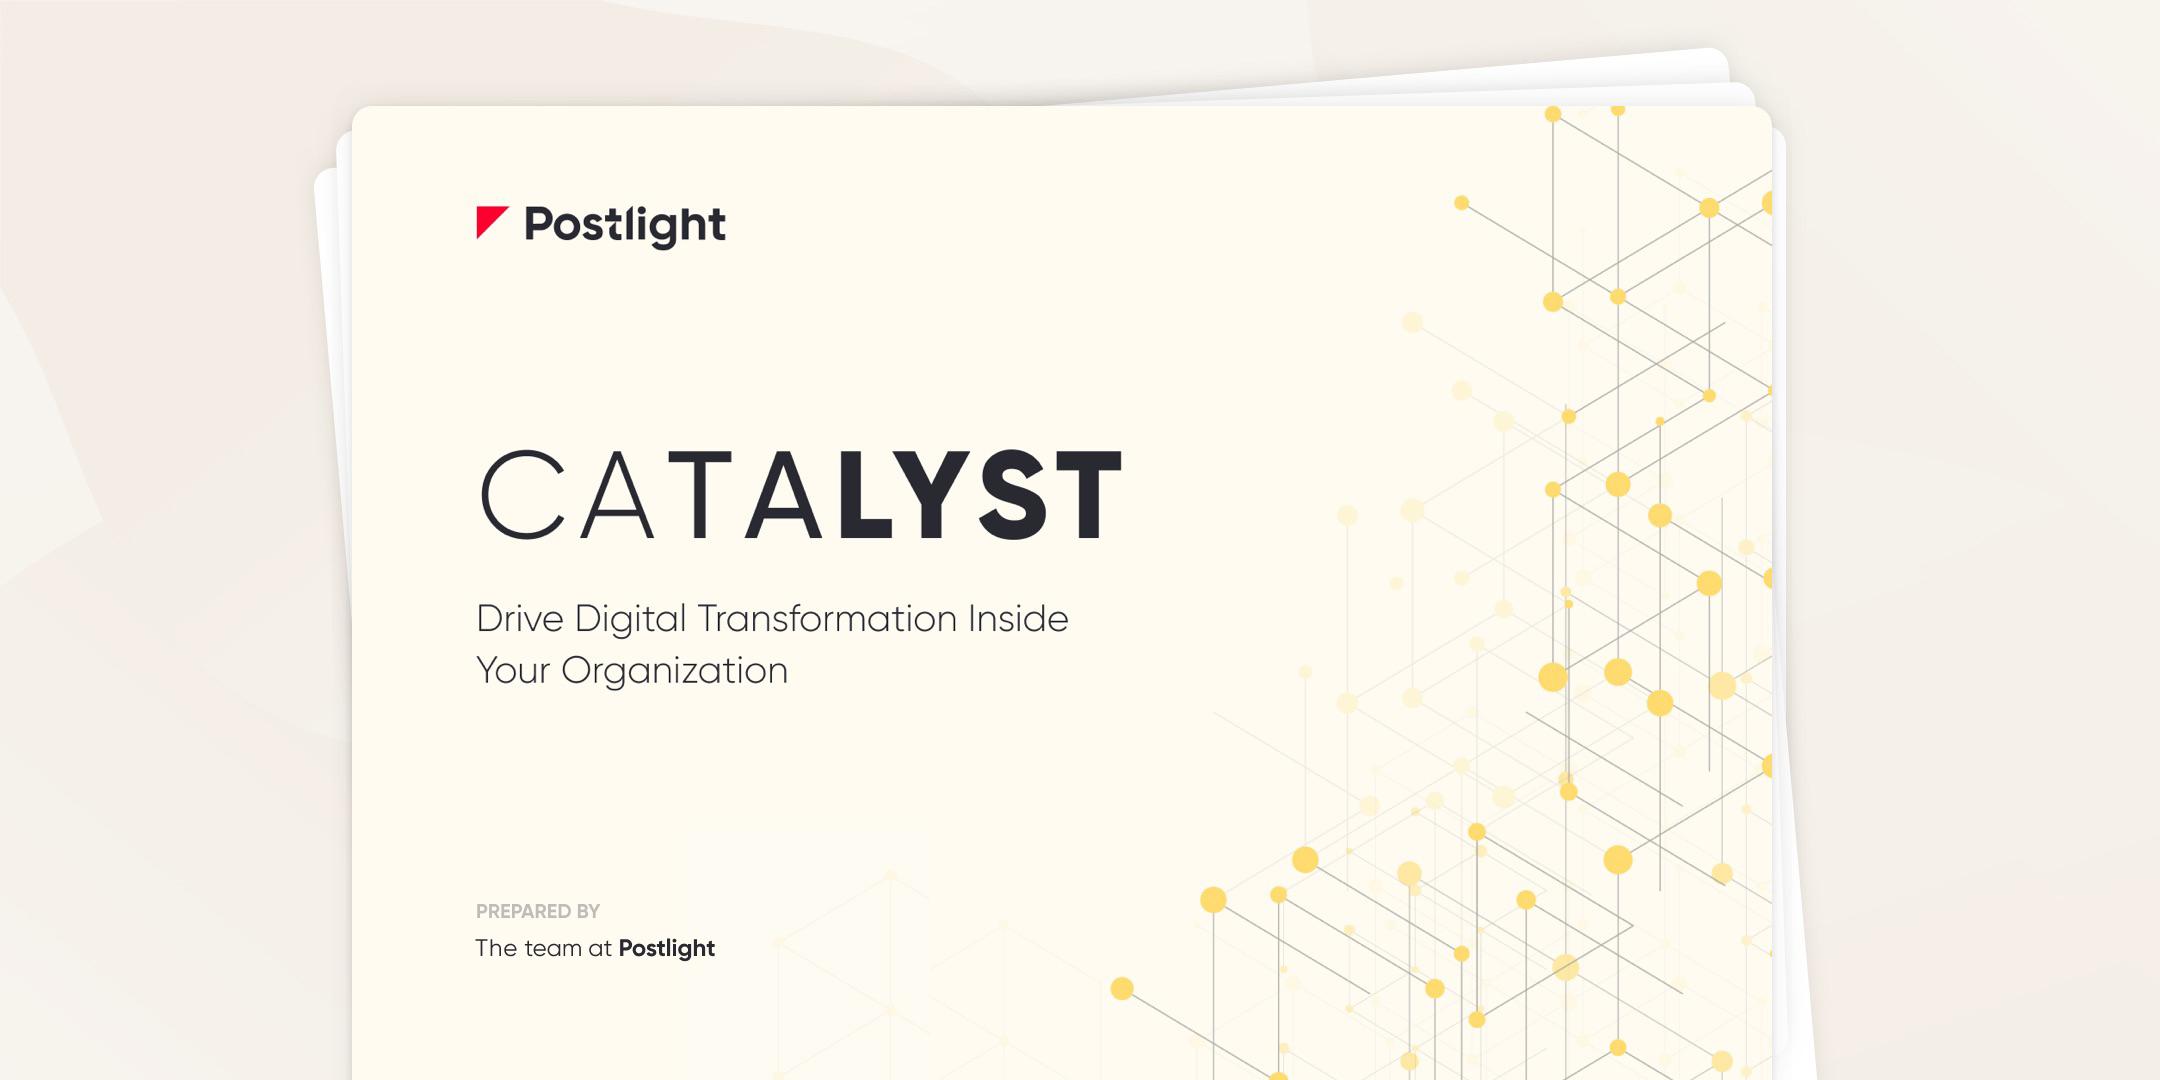 Catalyst white paper